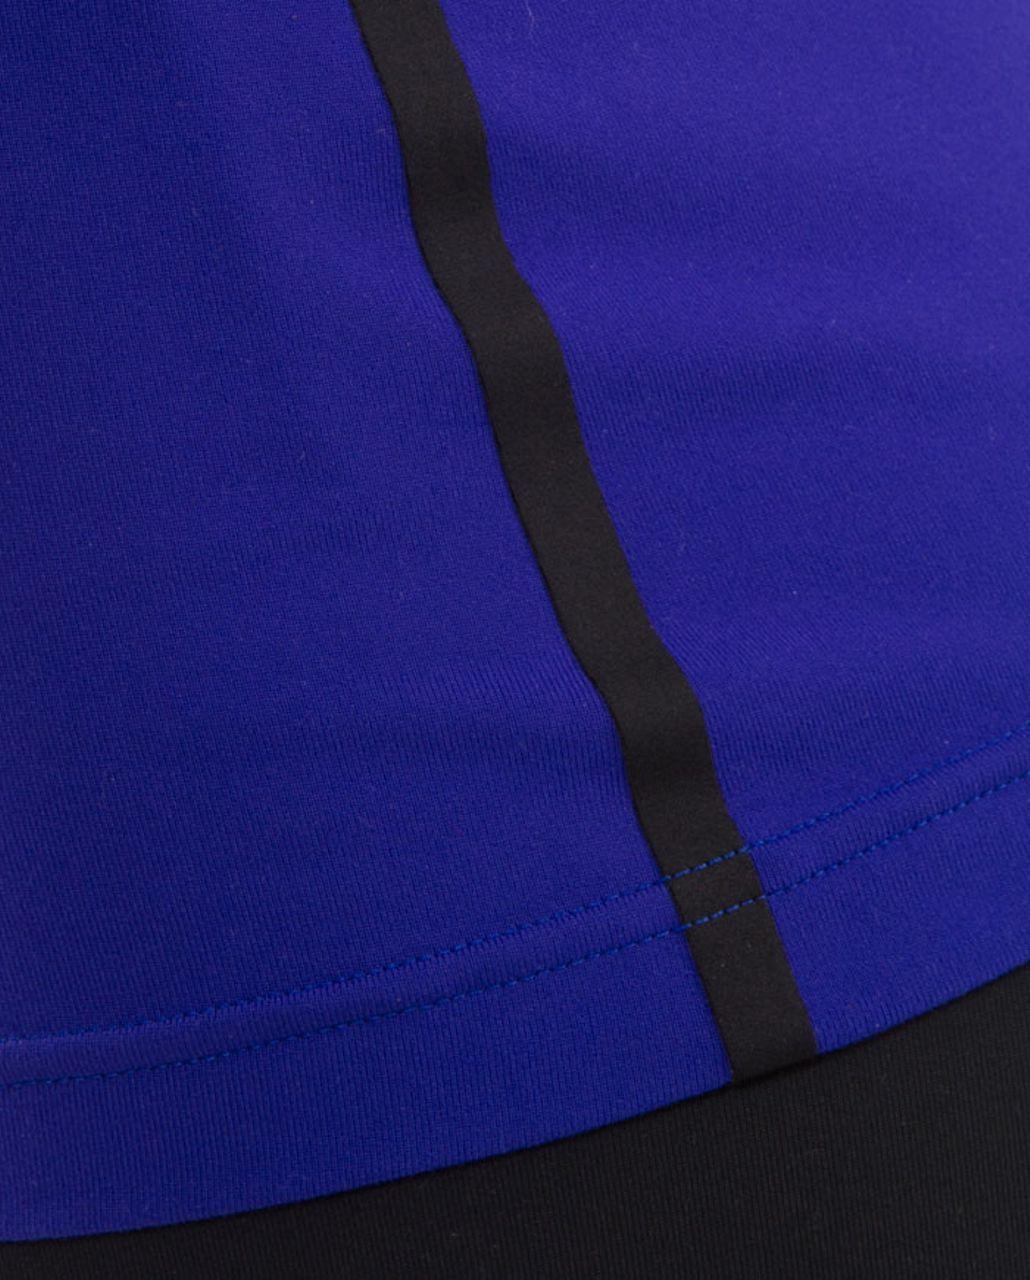 Lululemon Cool Racerback *Bonded - Pigment Blue /  Black